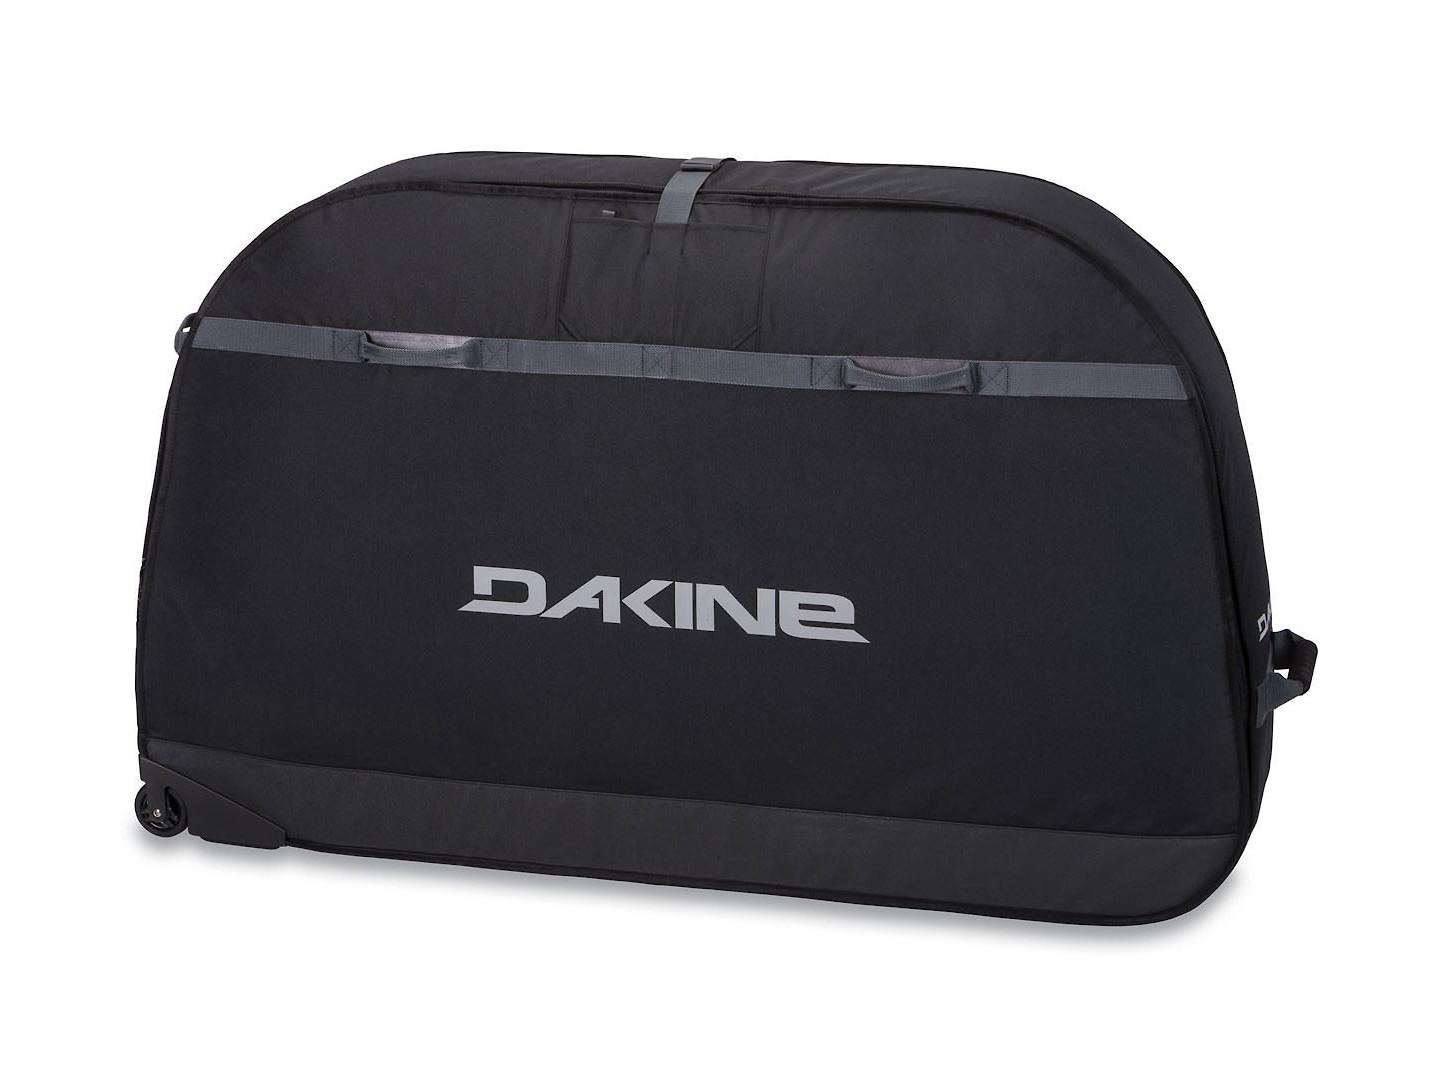 Dakine Roller Bike Travel Bag Reviews Comparisons Specs Mountain Bags Vital Mtb